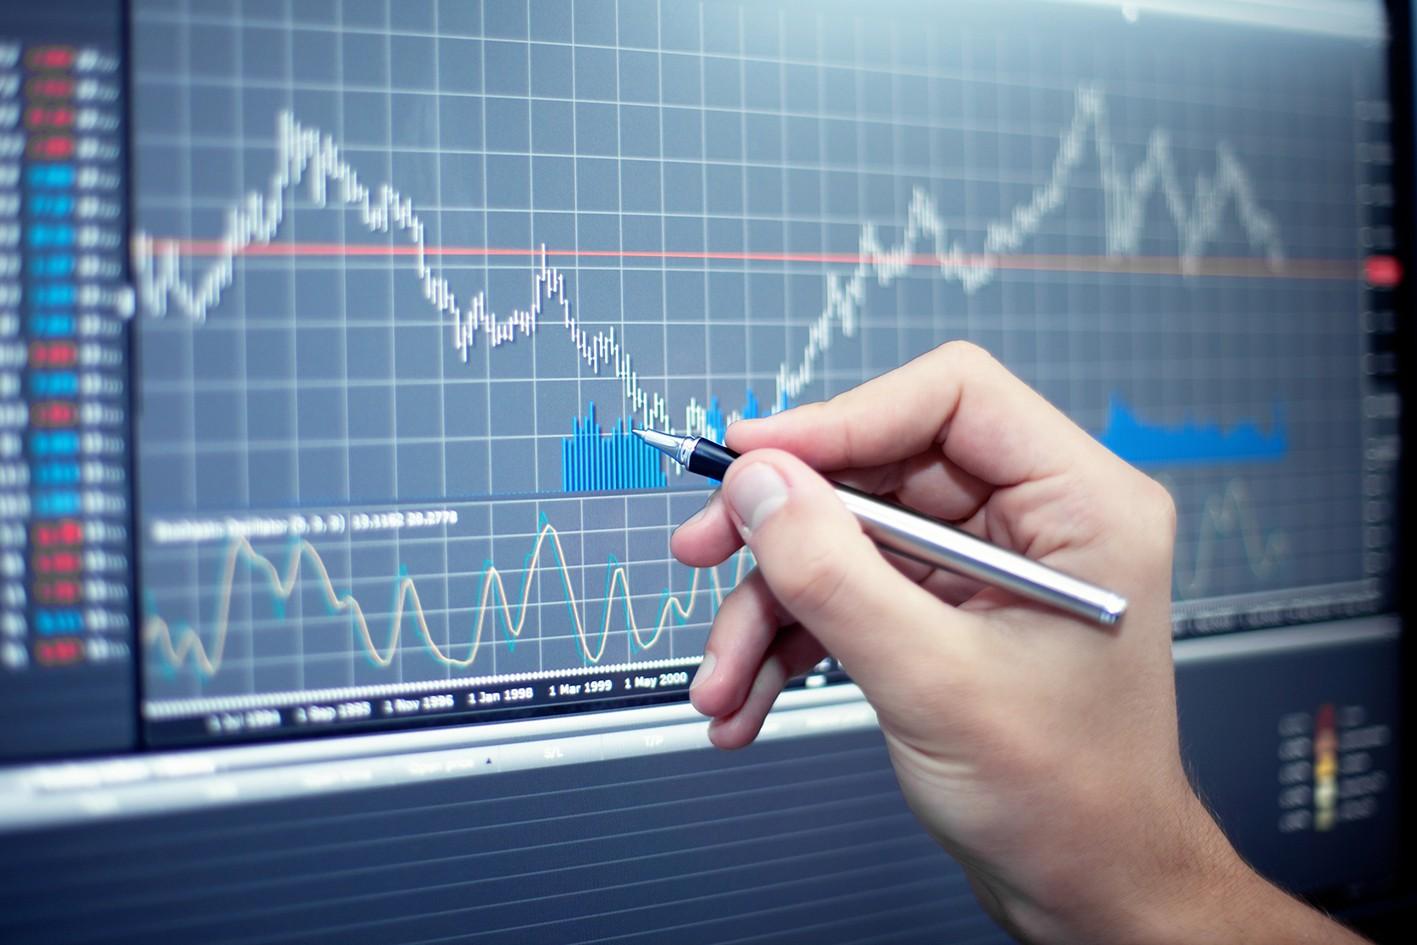 Показатели динамики на бирже